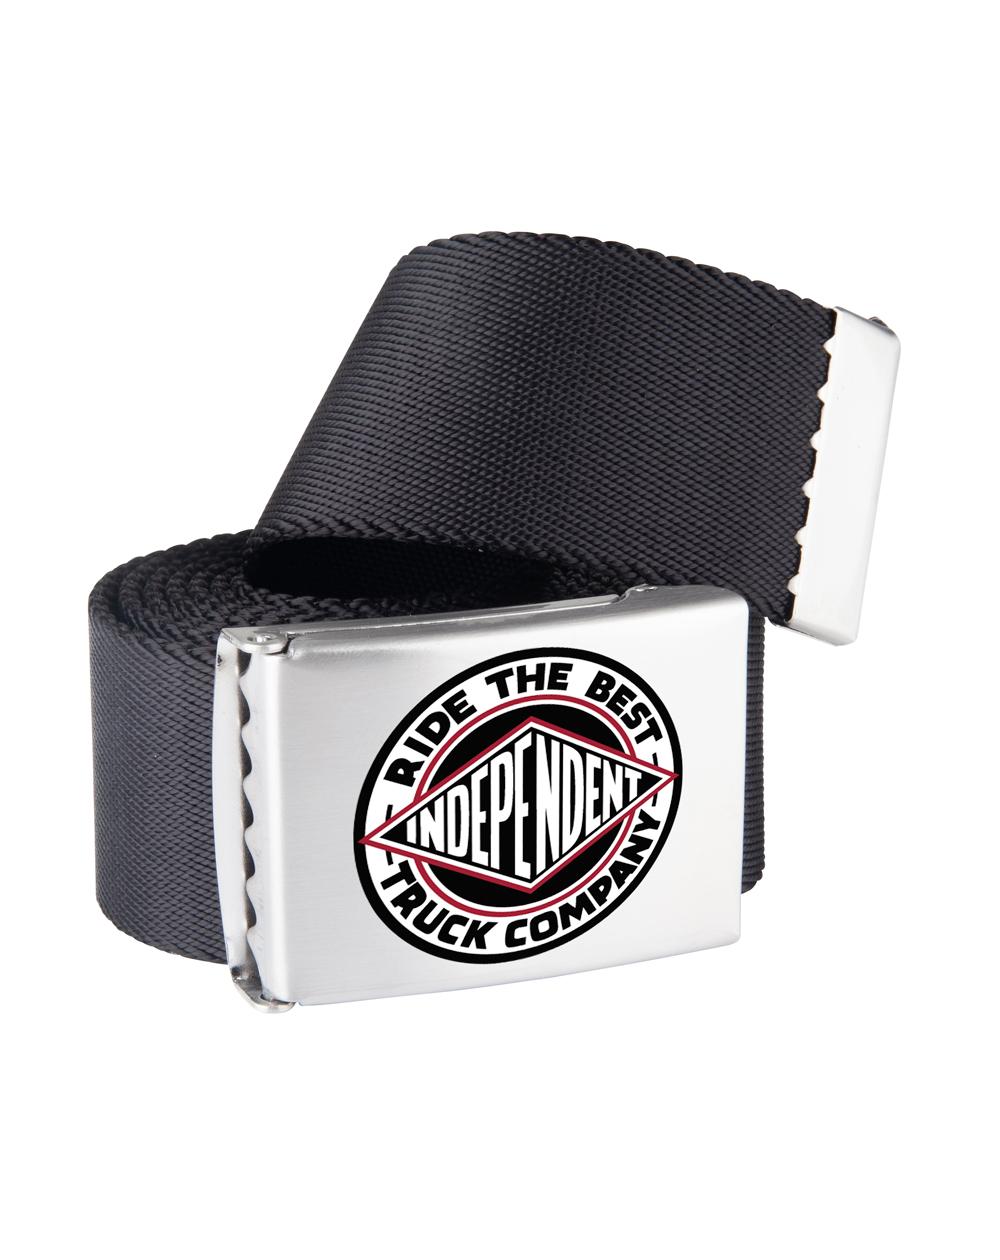 Independent Men's Belt RTB Summit Black